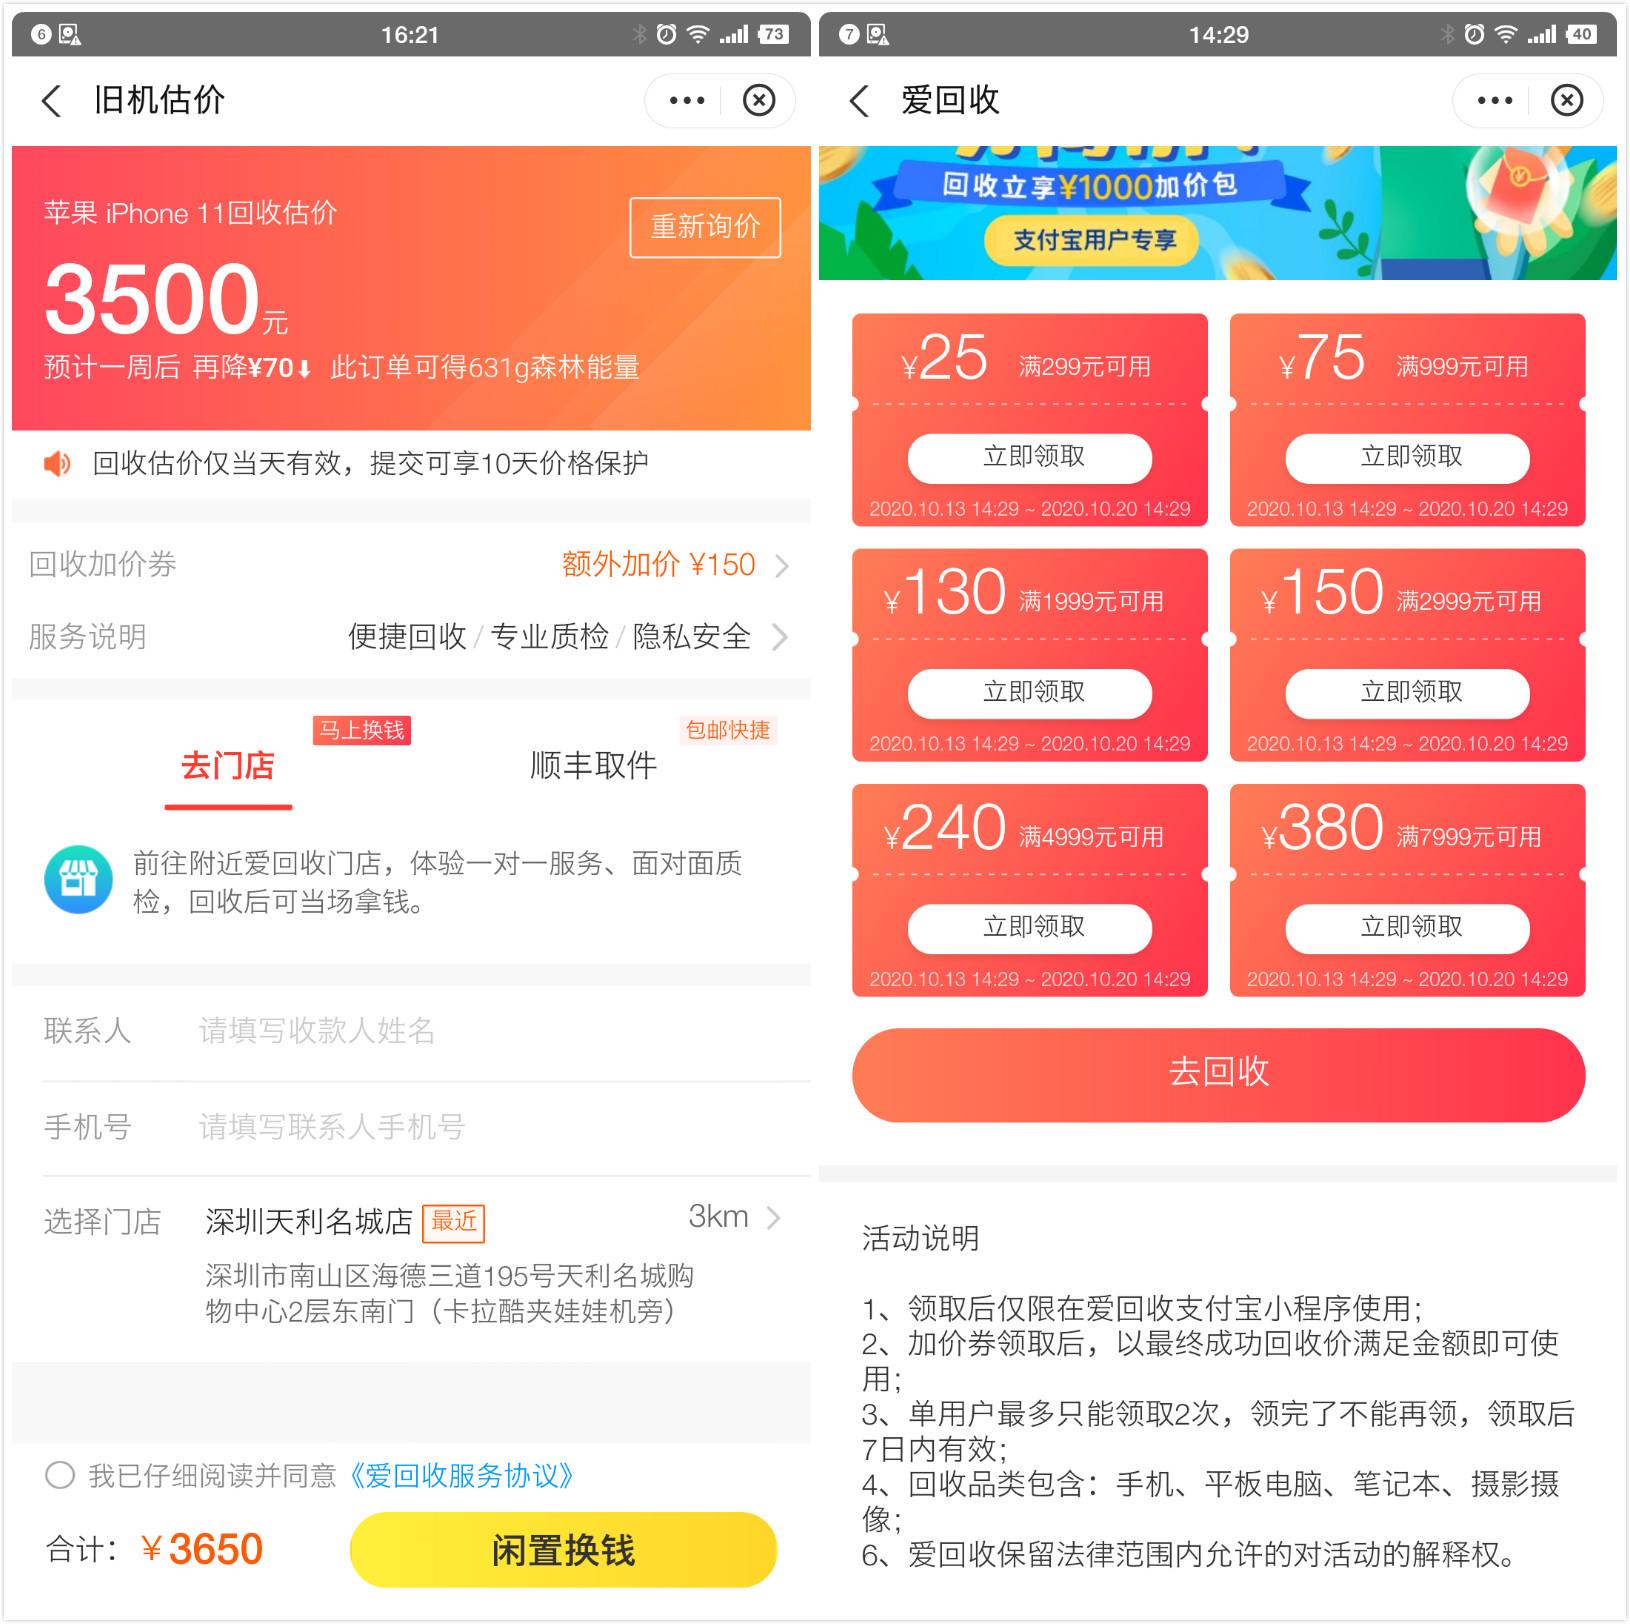 i2020 iPhone12发布了,iPhone 11手机回收还值多少呢?